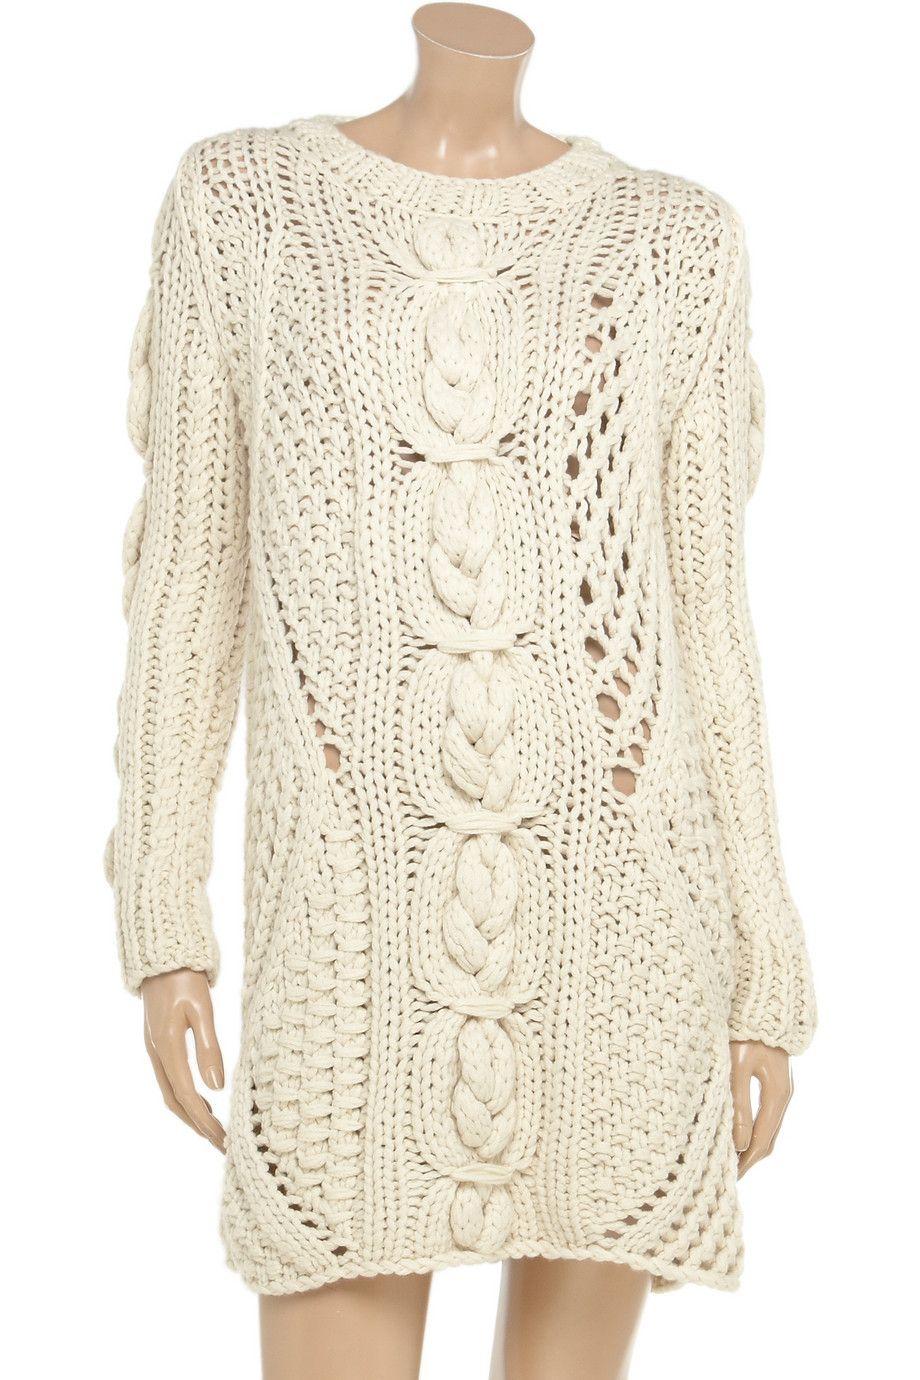 Pringle of Scotland Aran knit cashmere sweater dress 85% Off ...